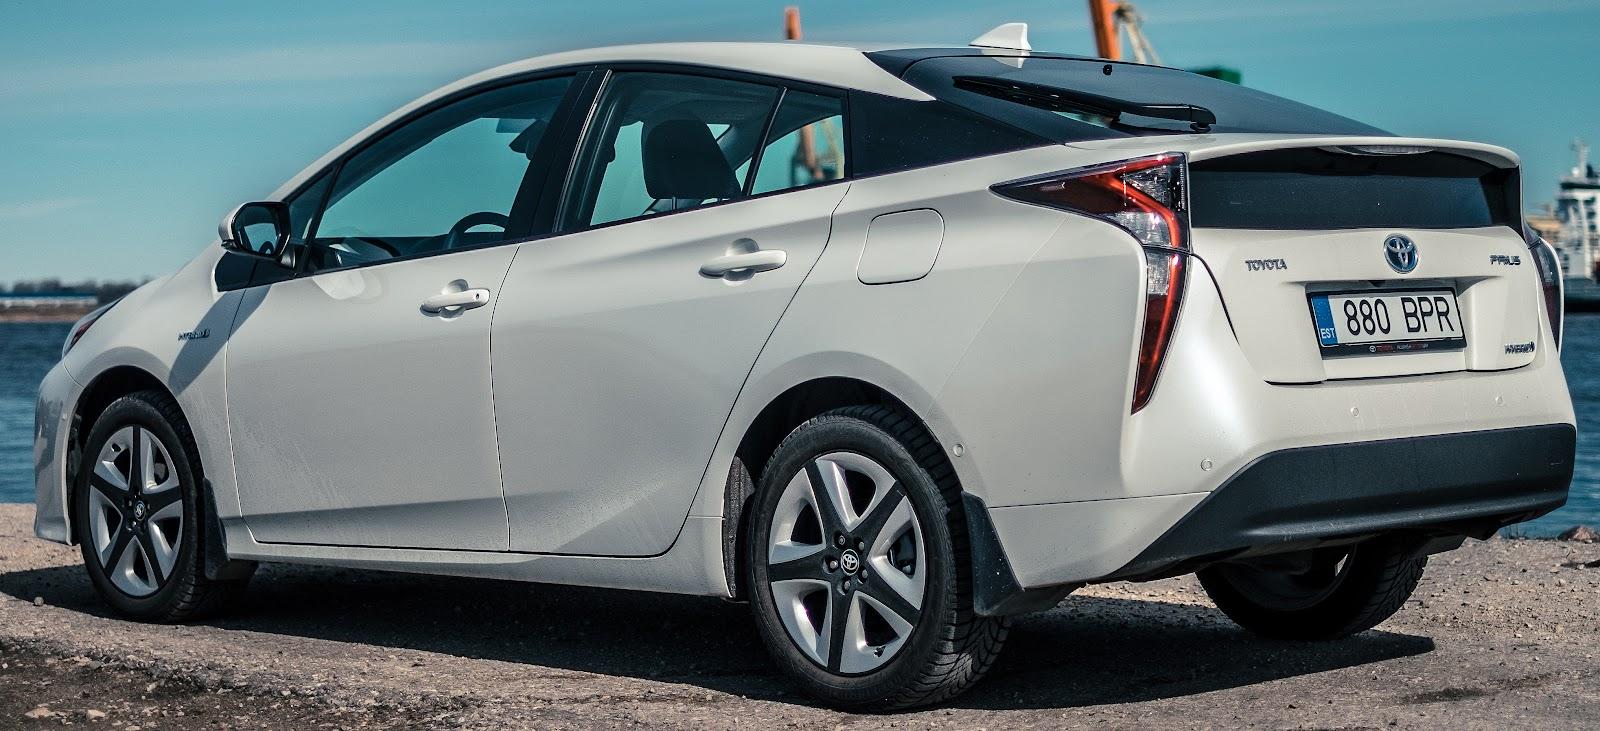 Superbe File:2016 Toyota Prius (ZVW50R) Hybrid Liftback (2016 04 02